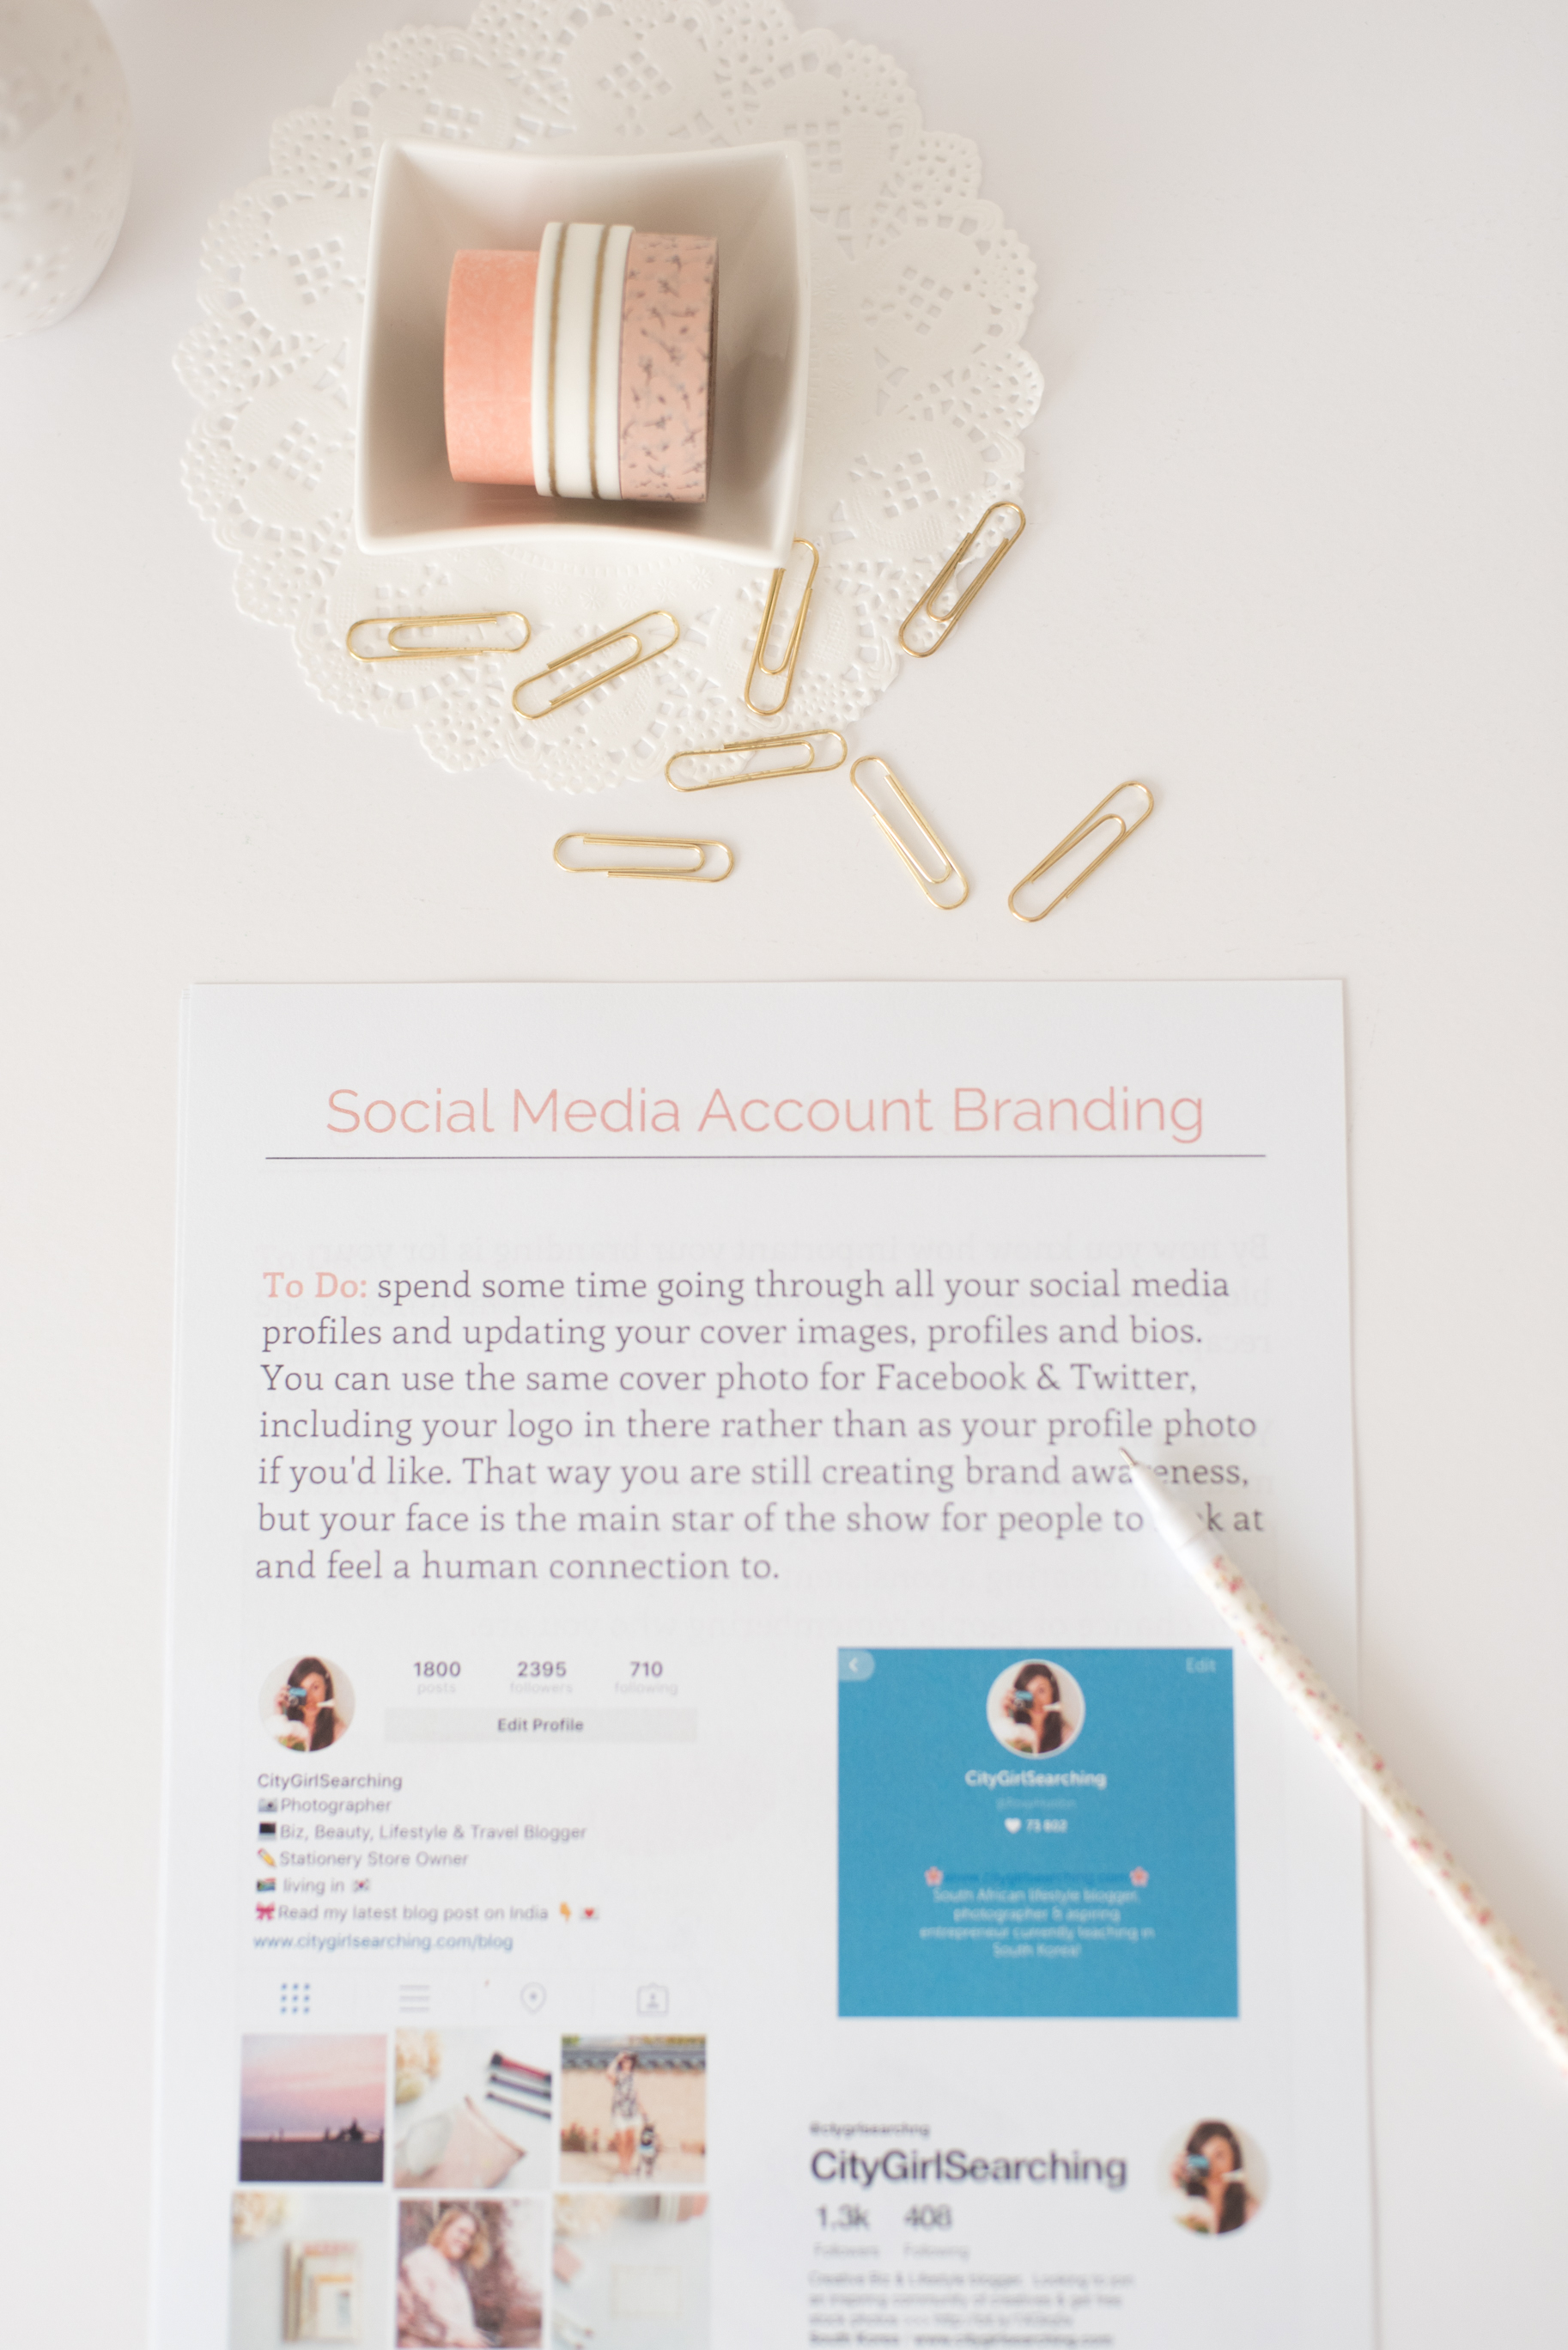 #BeautifyYourBlog Handguide for Bloggers byr Roxy Hutton of CityGirlSearching (20 of 25).JPG